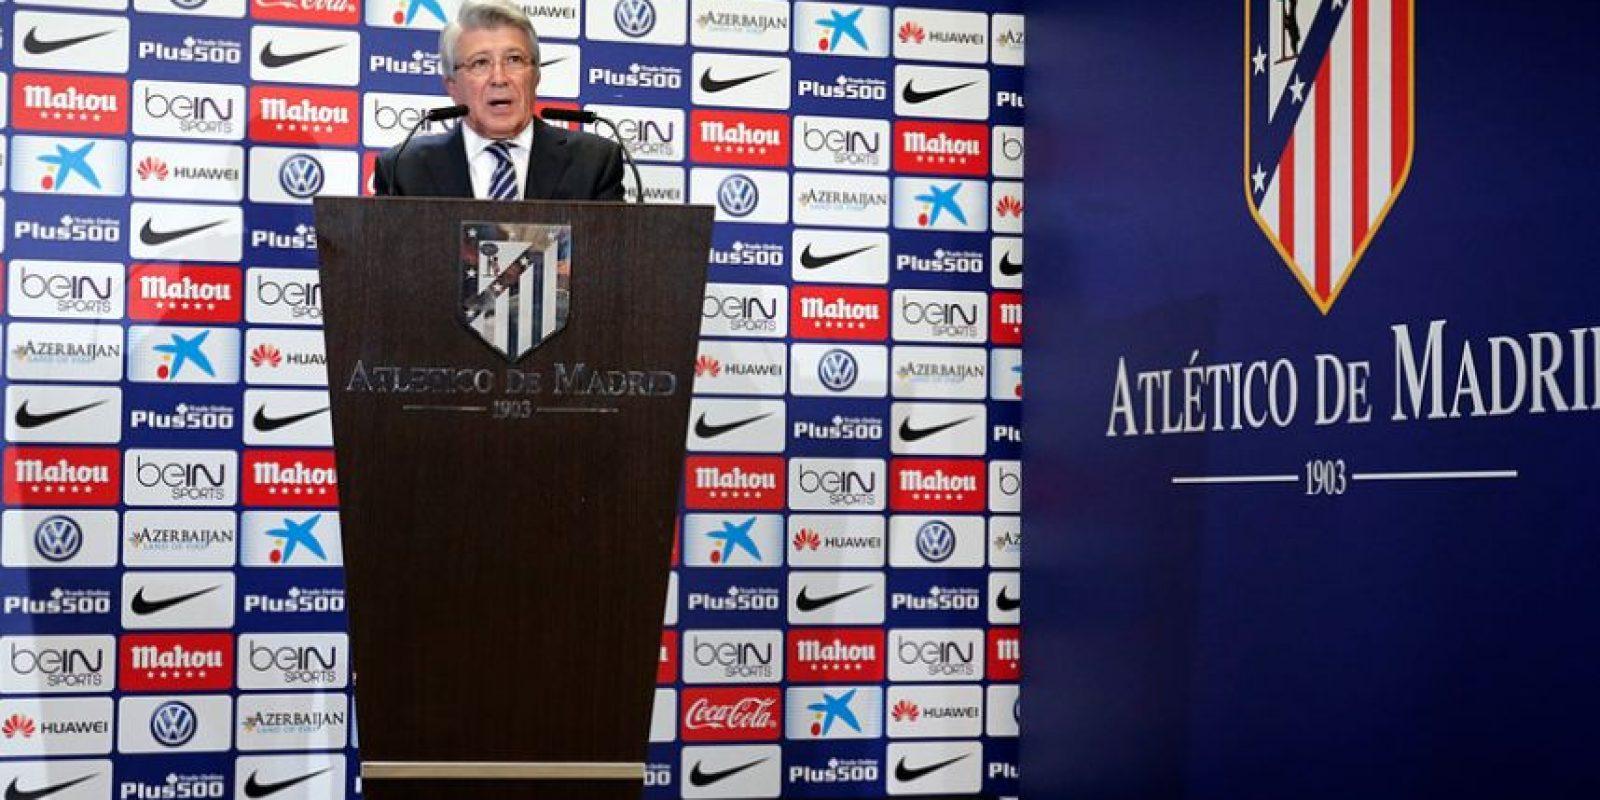 Foto:Atlético de Madrid/Ángel Gutiérrez